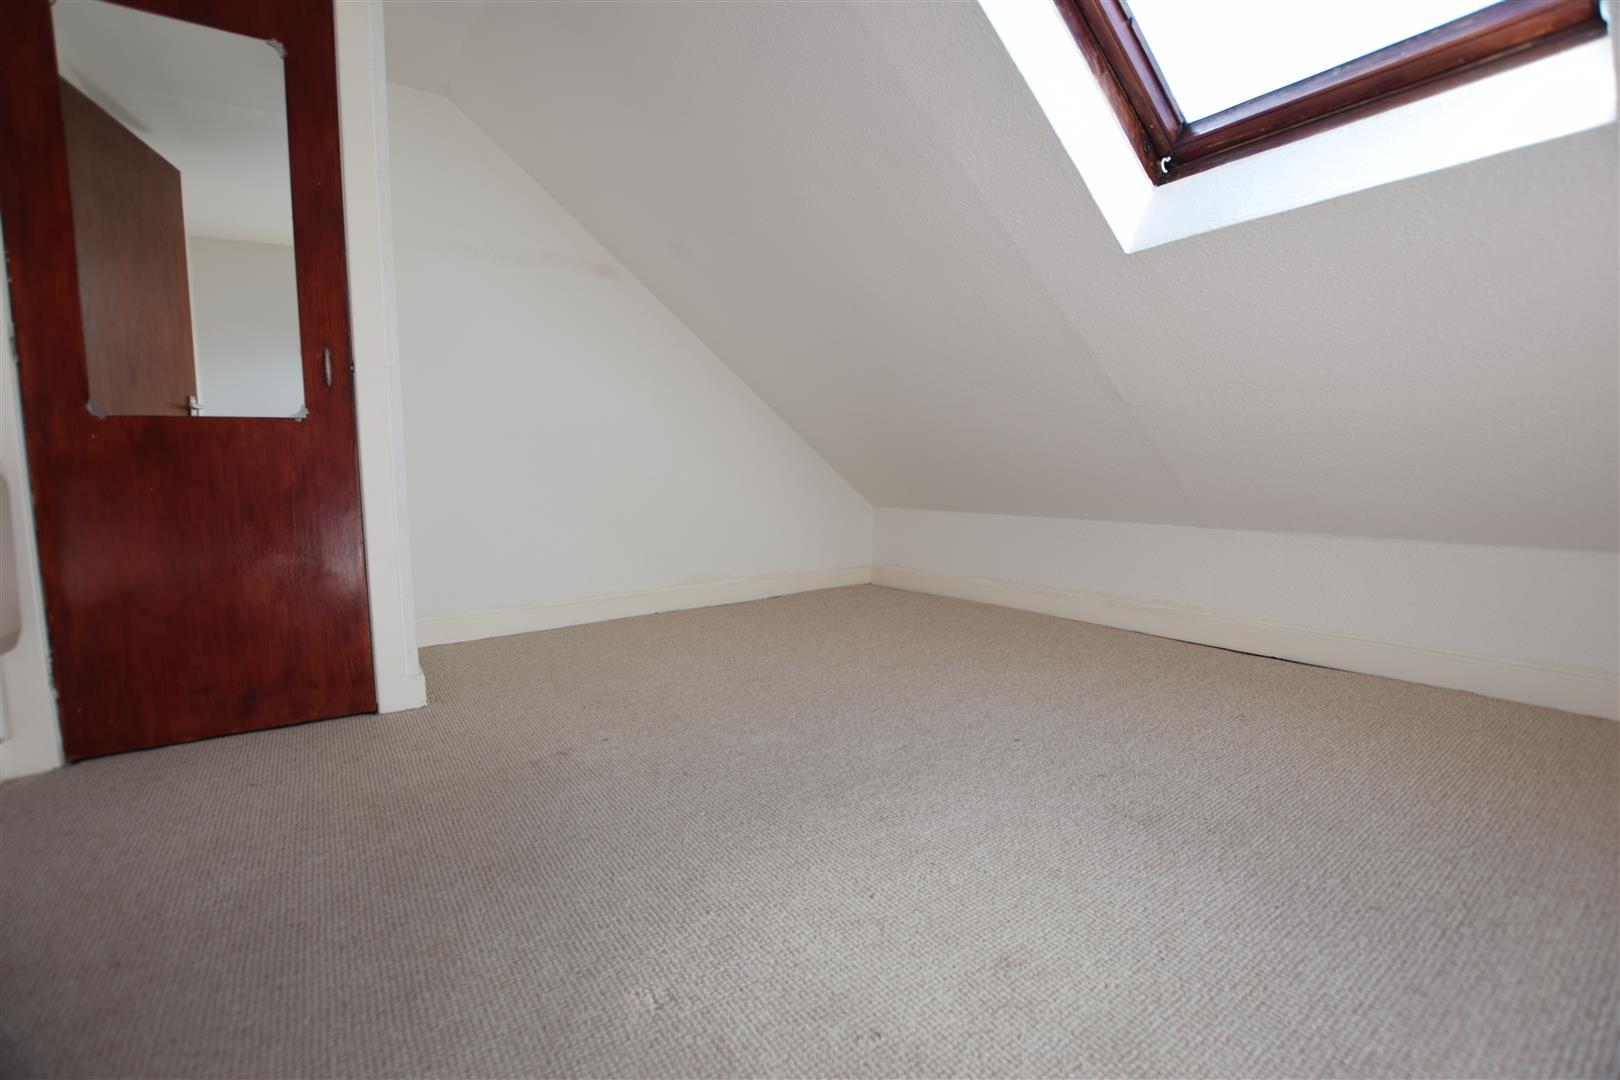 10A, Atholl Street, Dunkeld, Perthshire, PH8 0AR, UK